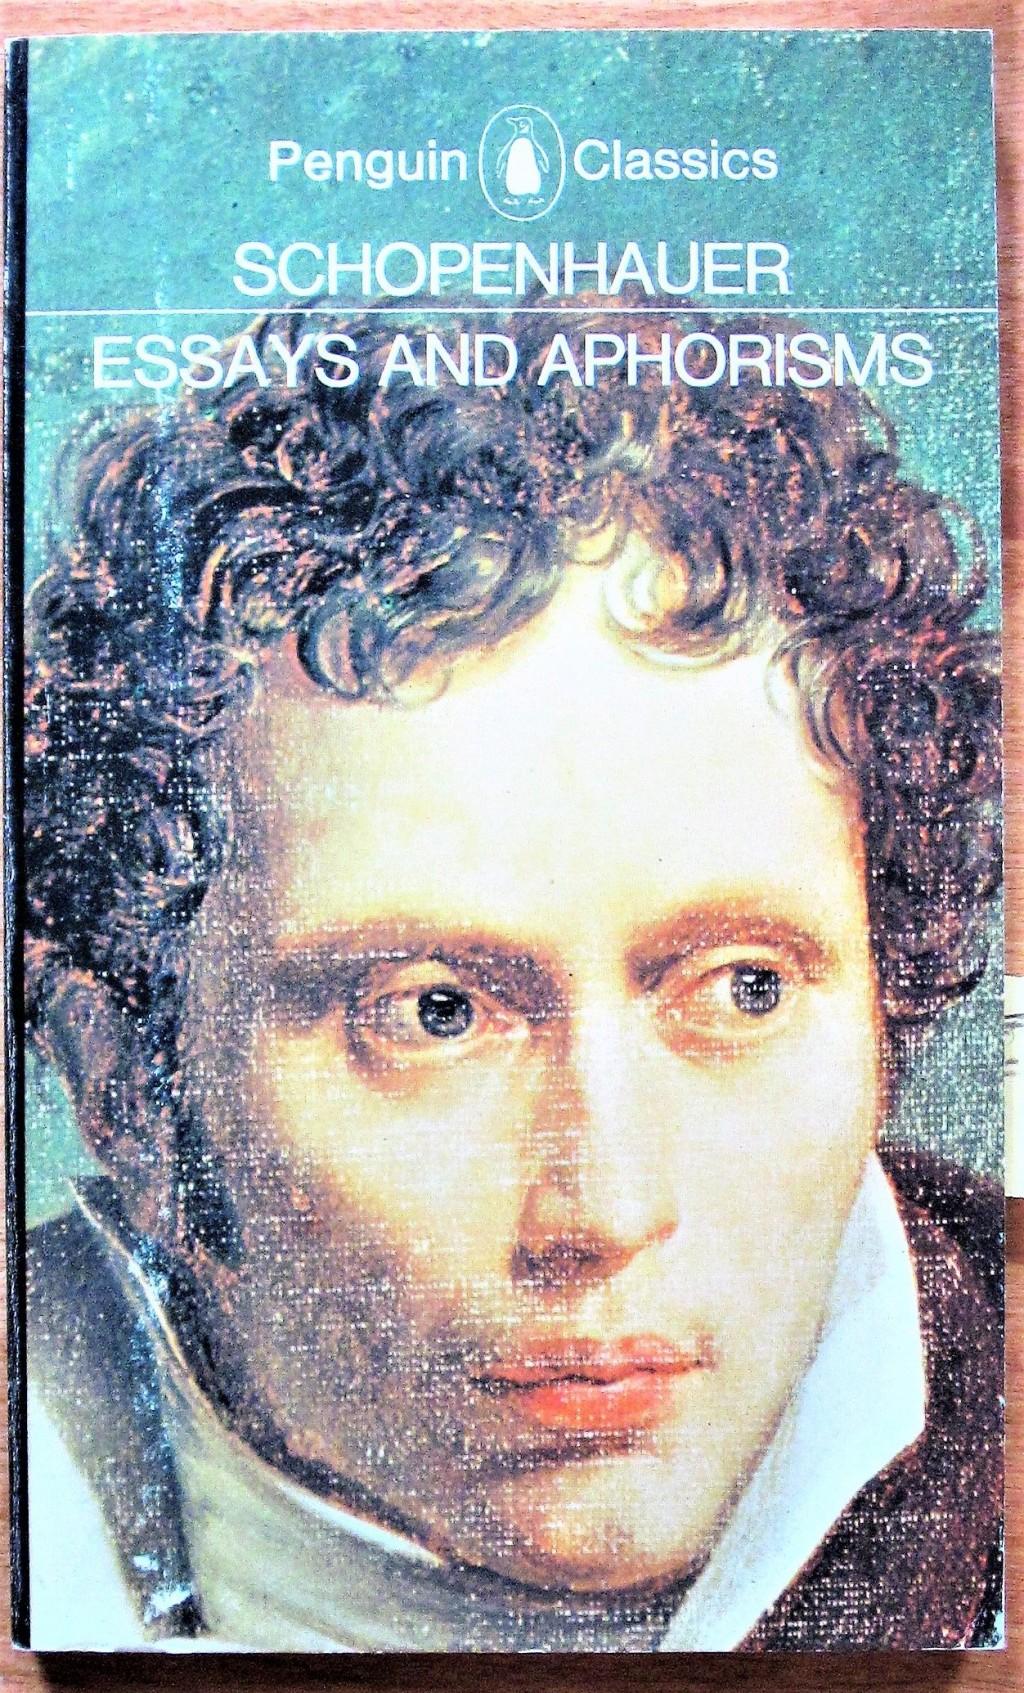 003 Essays And Aphorisms X Essay Frightening By Arthur Schopenhauer Pdf Large